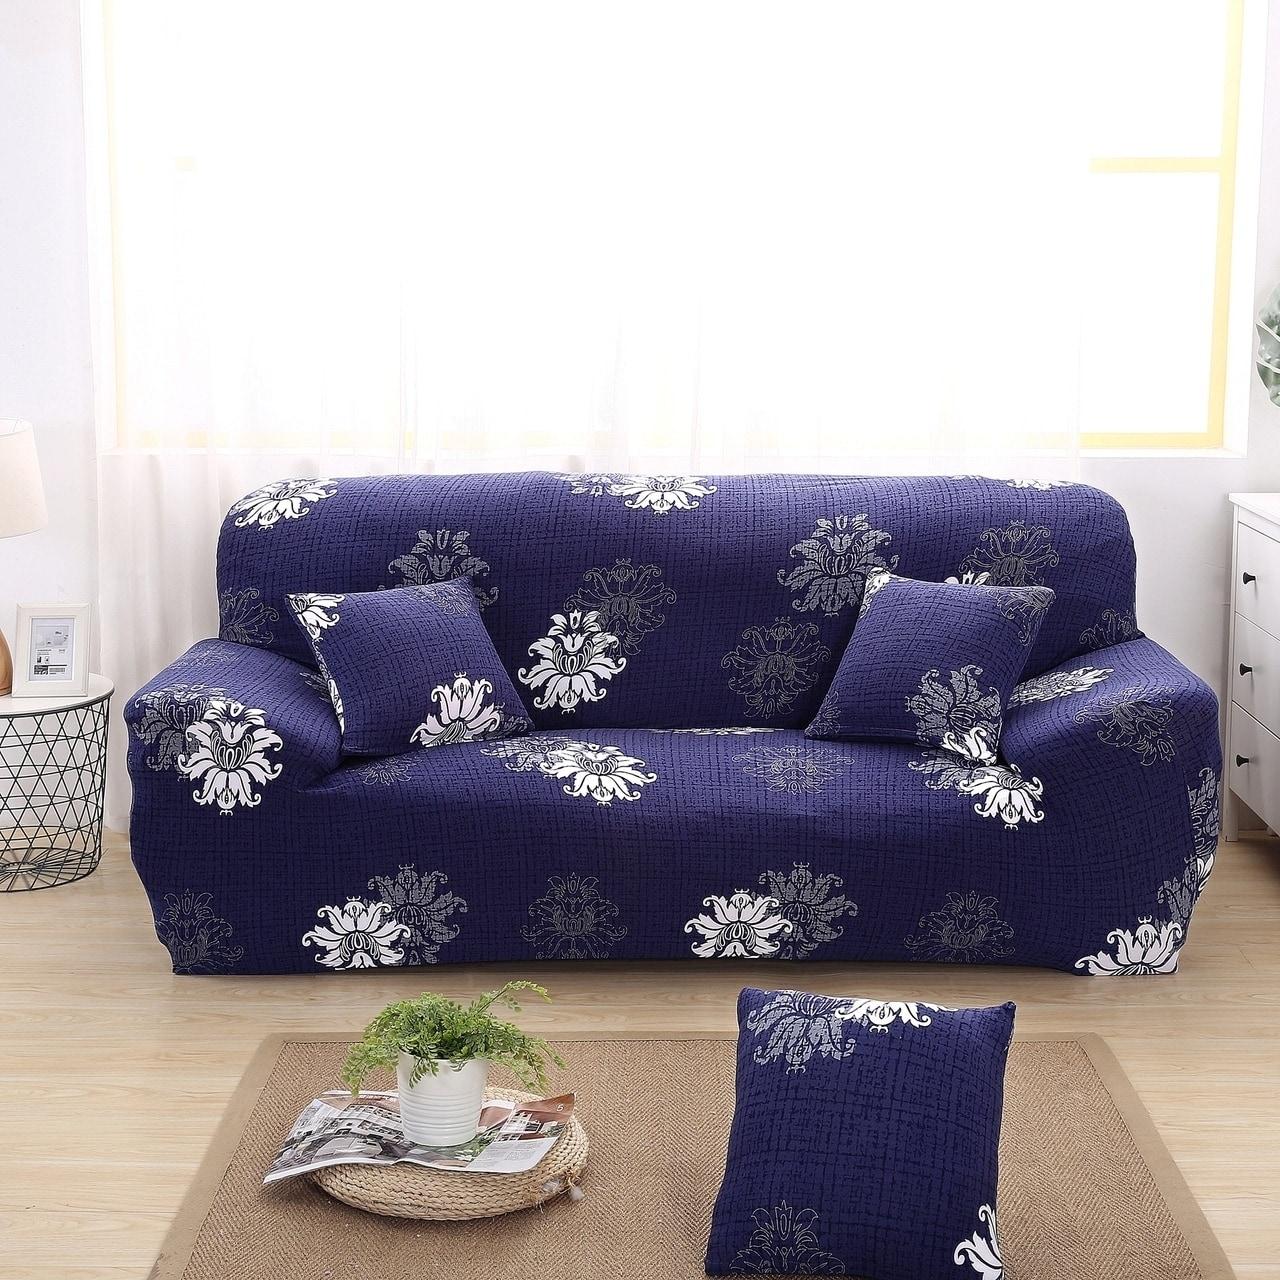 Enova Home Navy Blue Elegant Polyester and Spandex Stretch Washable Box  Cushion Sofa Slipcover